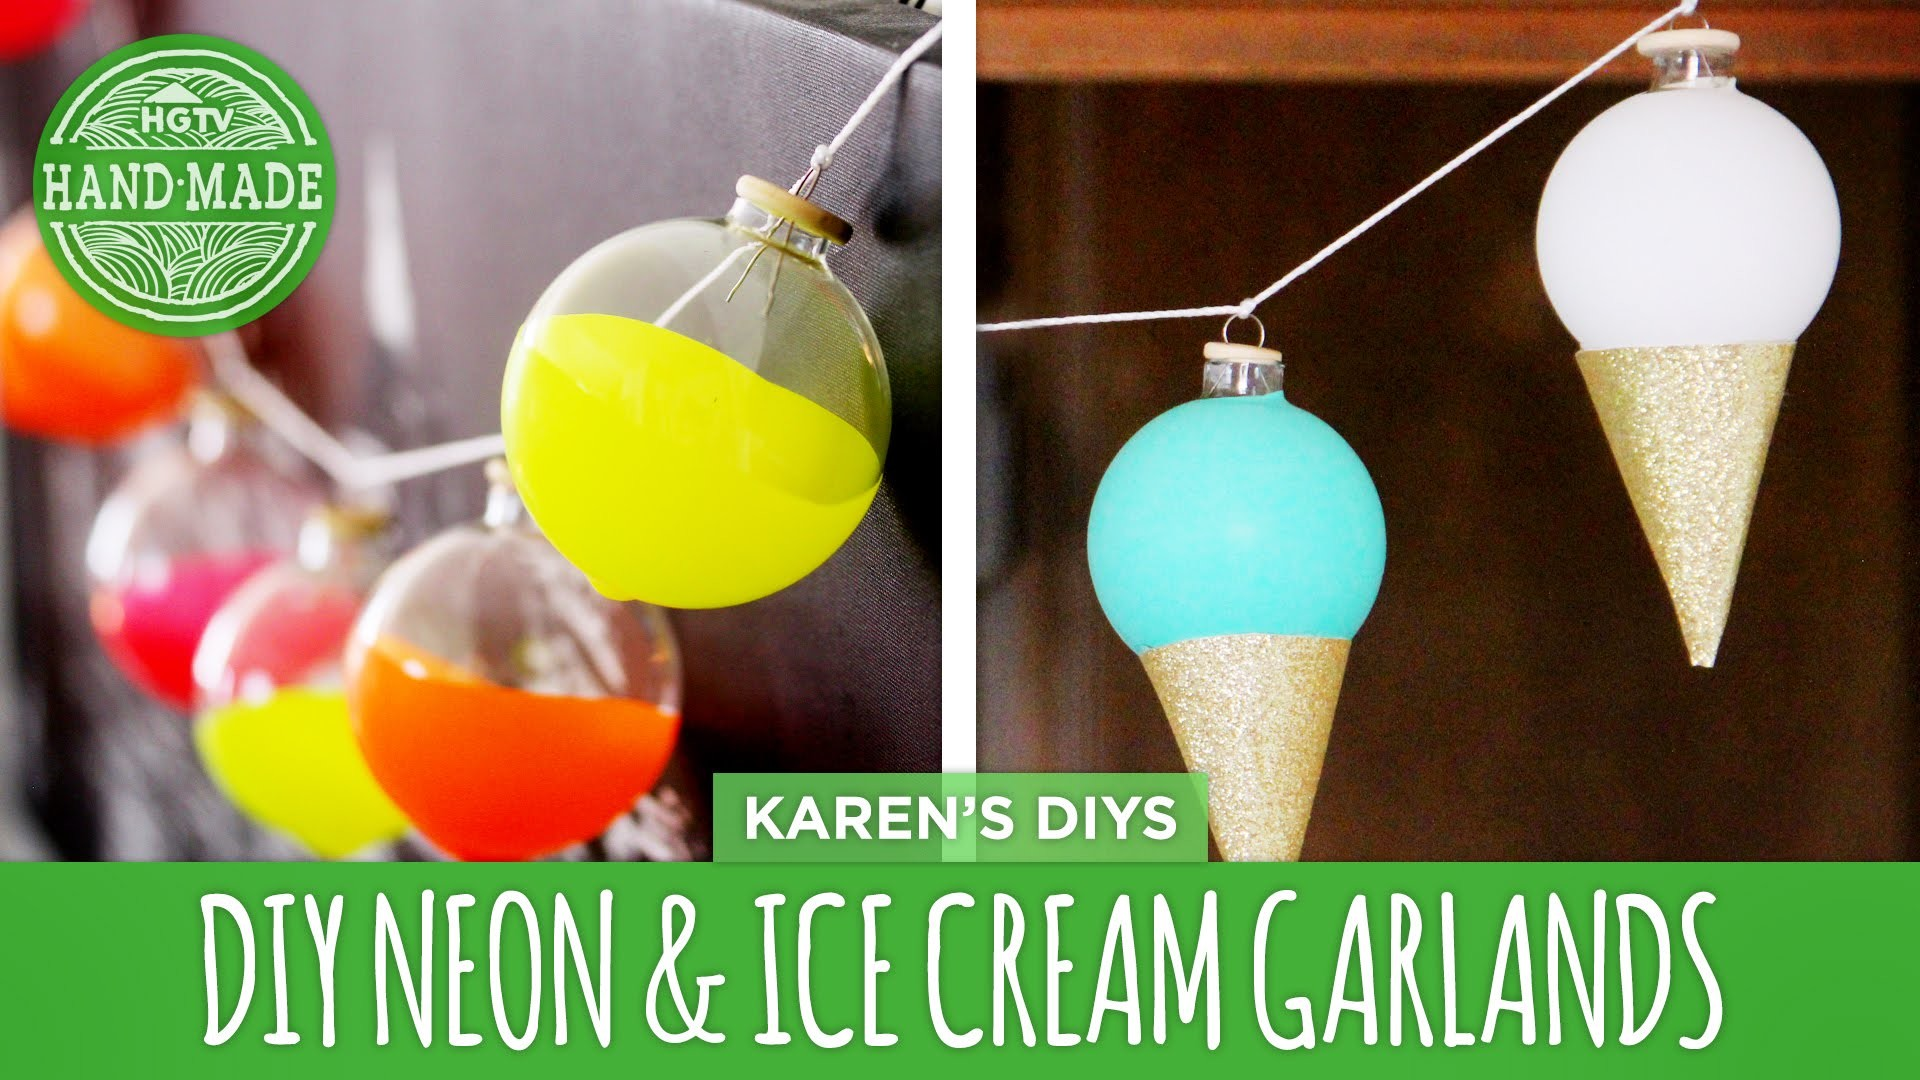 DIY Colorblocked Neon & Ice Cream Springtime Garlands - HGTV Handmade